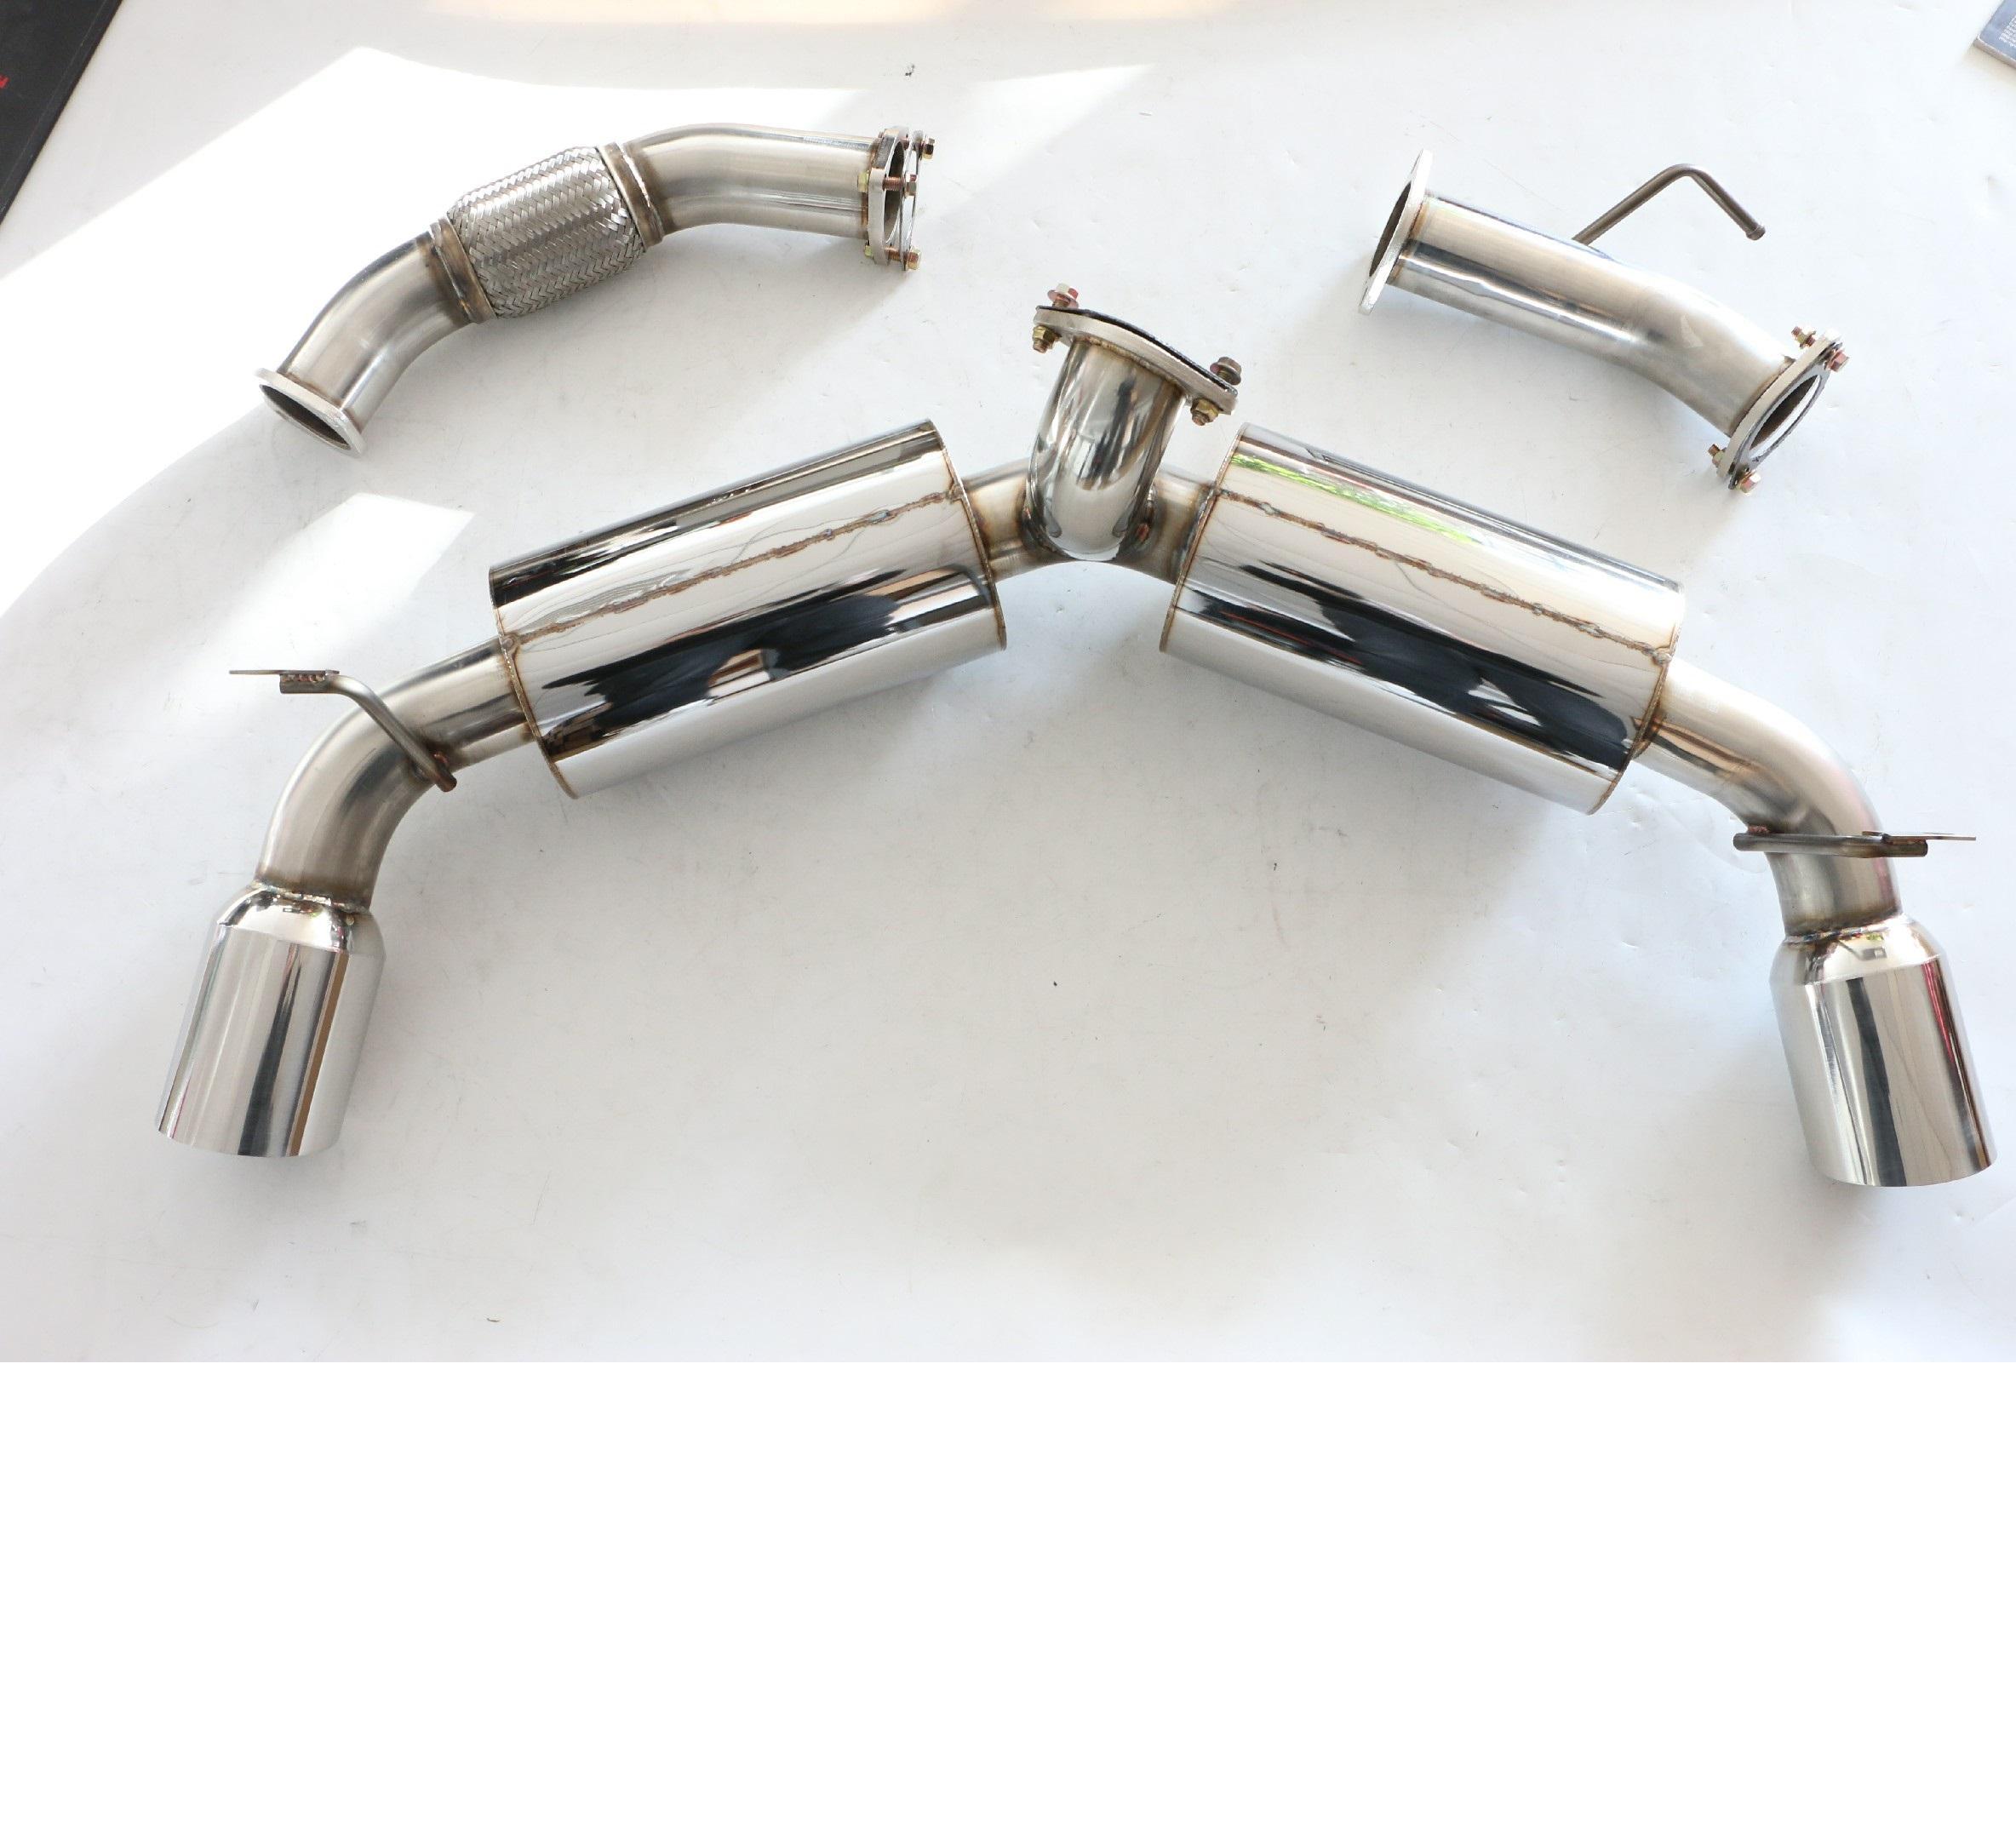 20 degree 2.5 Inch Mandrel Bend Exhaust pipe custom DIY Turbo downpipe muffler